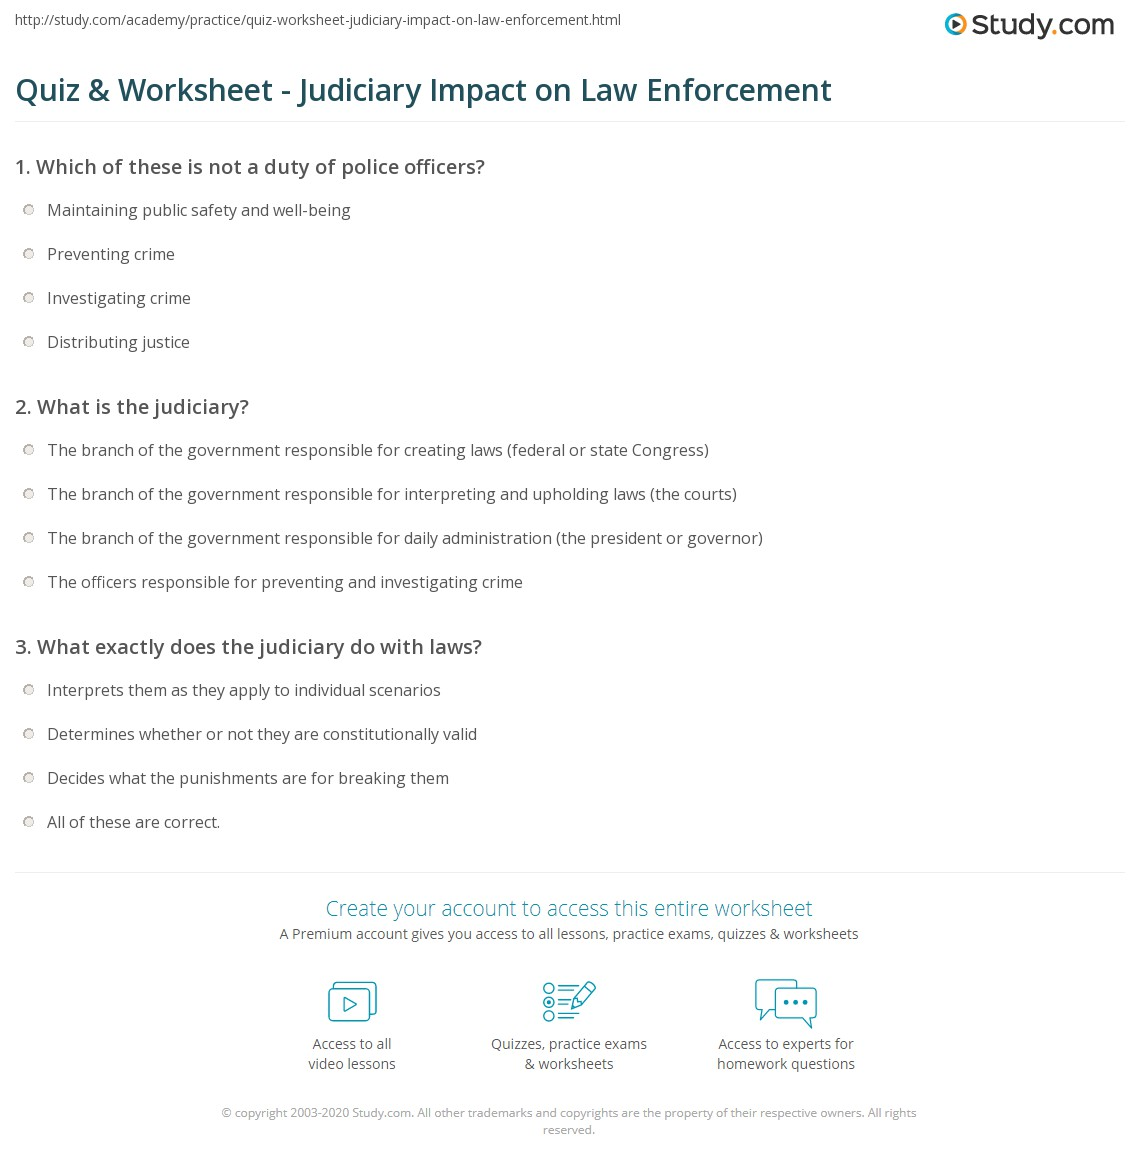 Quiz & Worksheet - Judiciary Impact on Law Enforcement | Study com